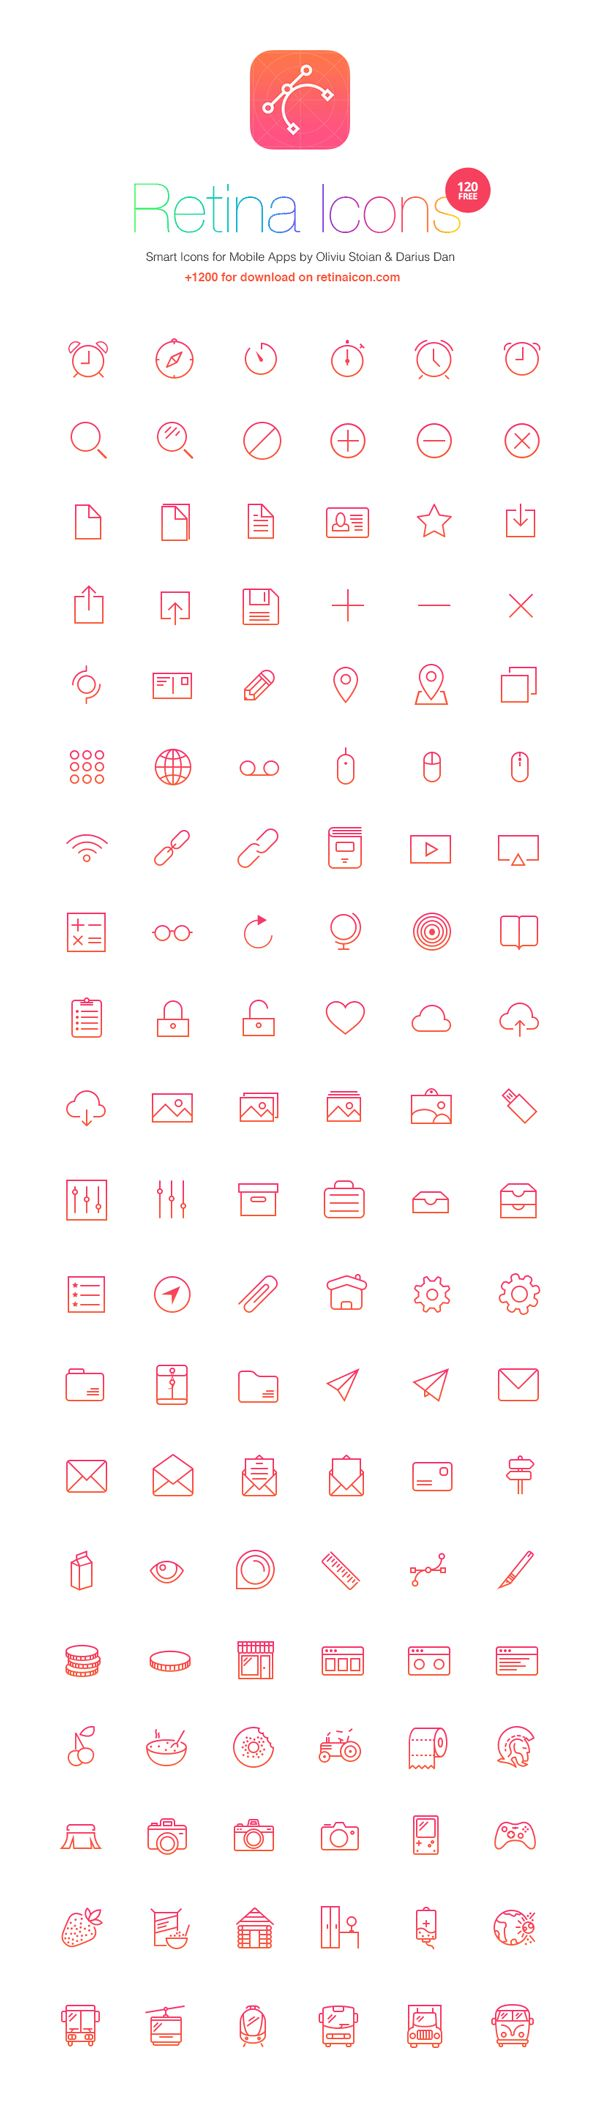 120 Free Icons - RetinaIcon | GraphicBurger